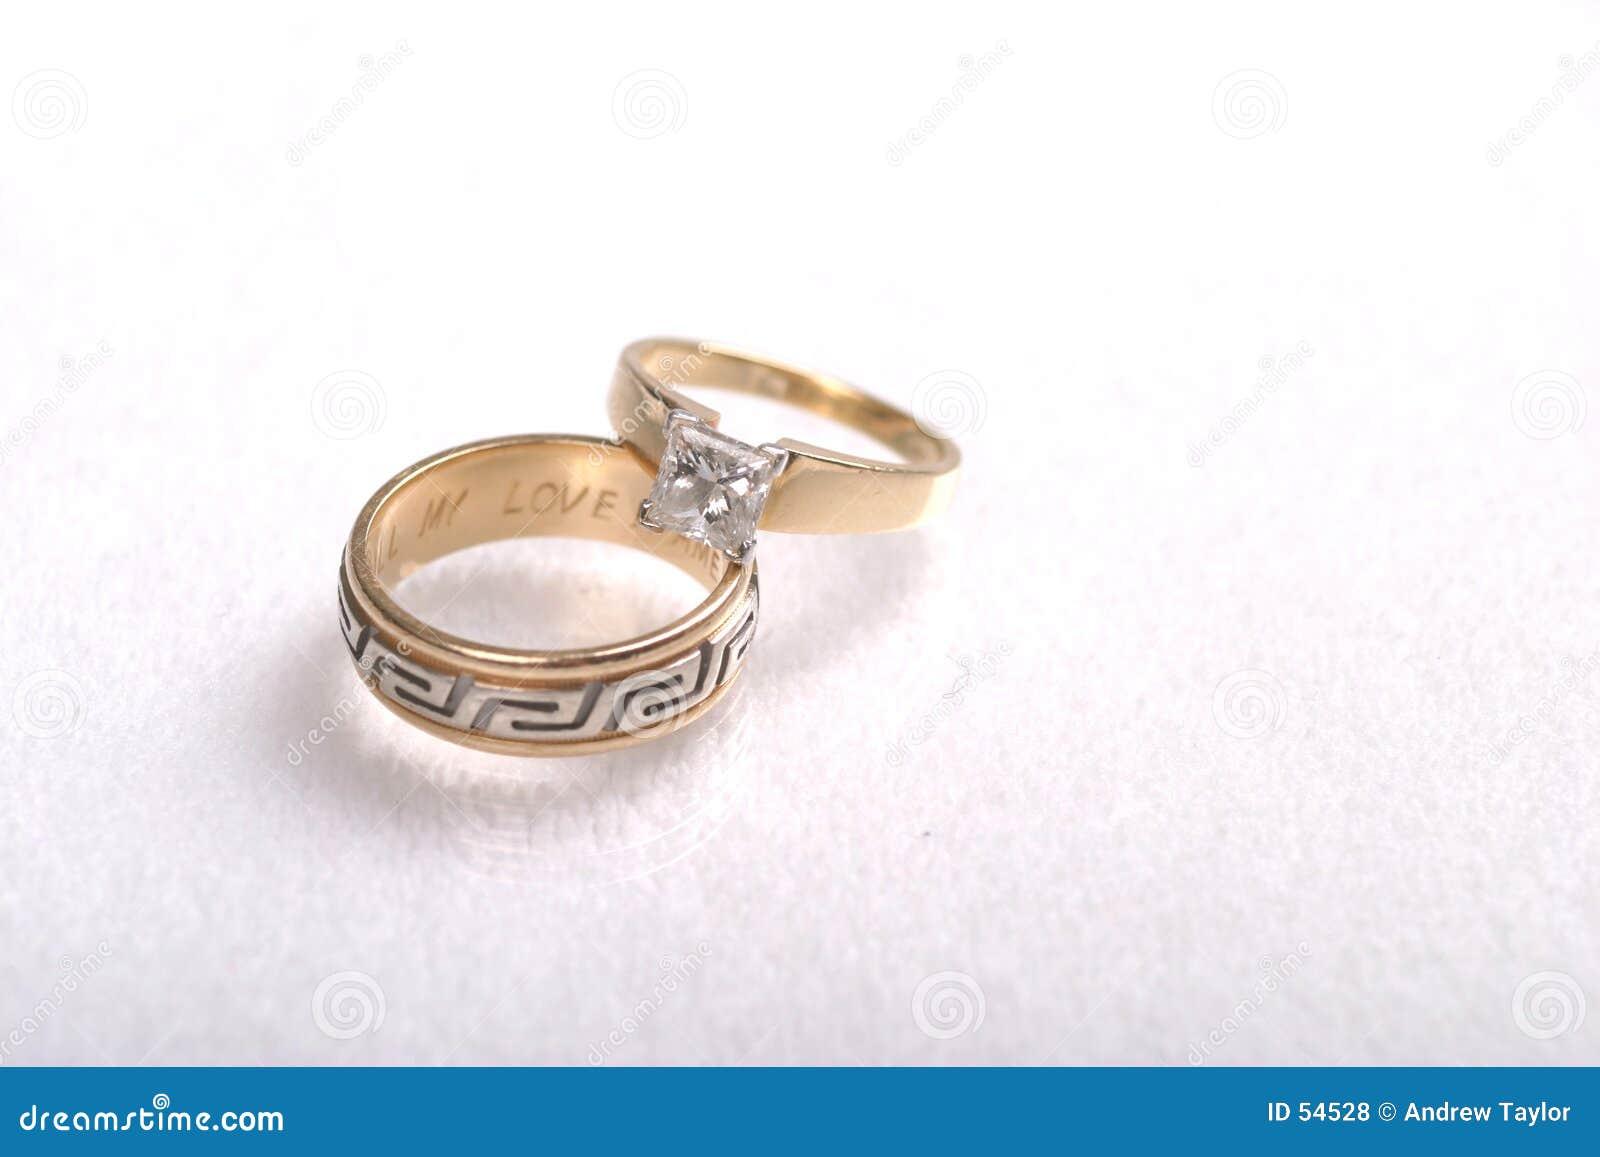 Huwelijk Rings1